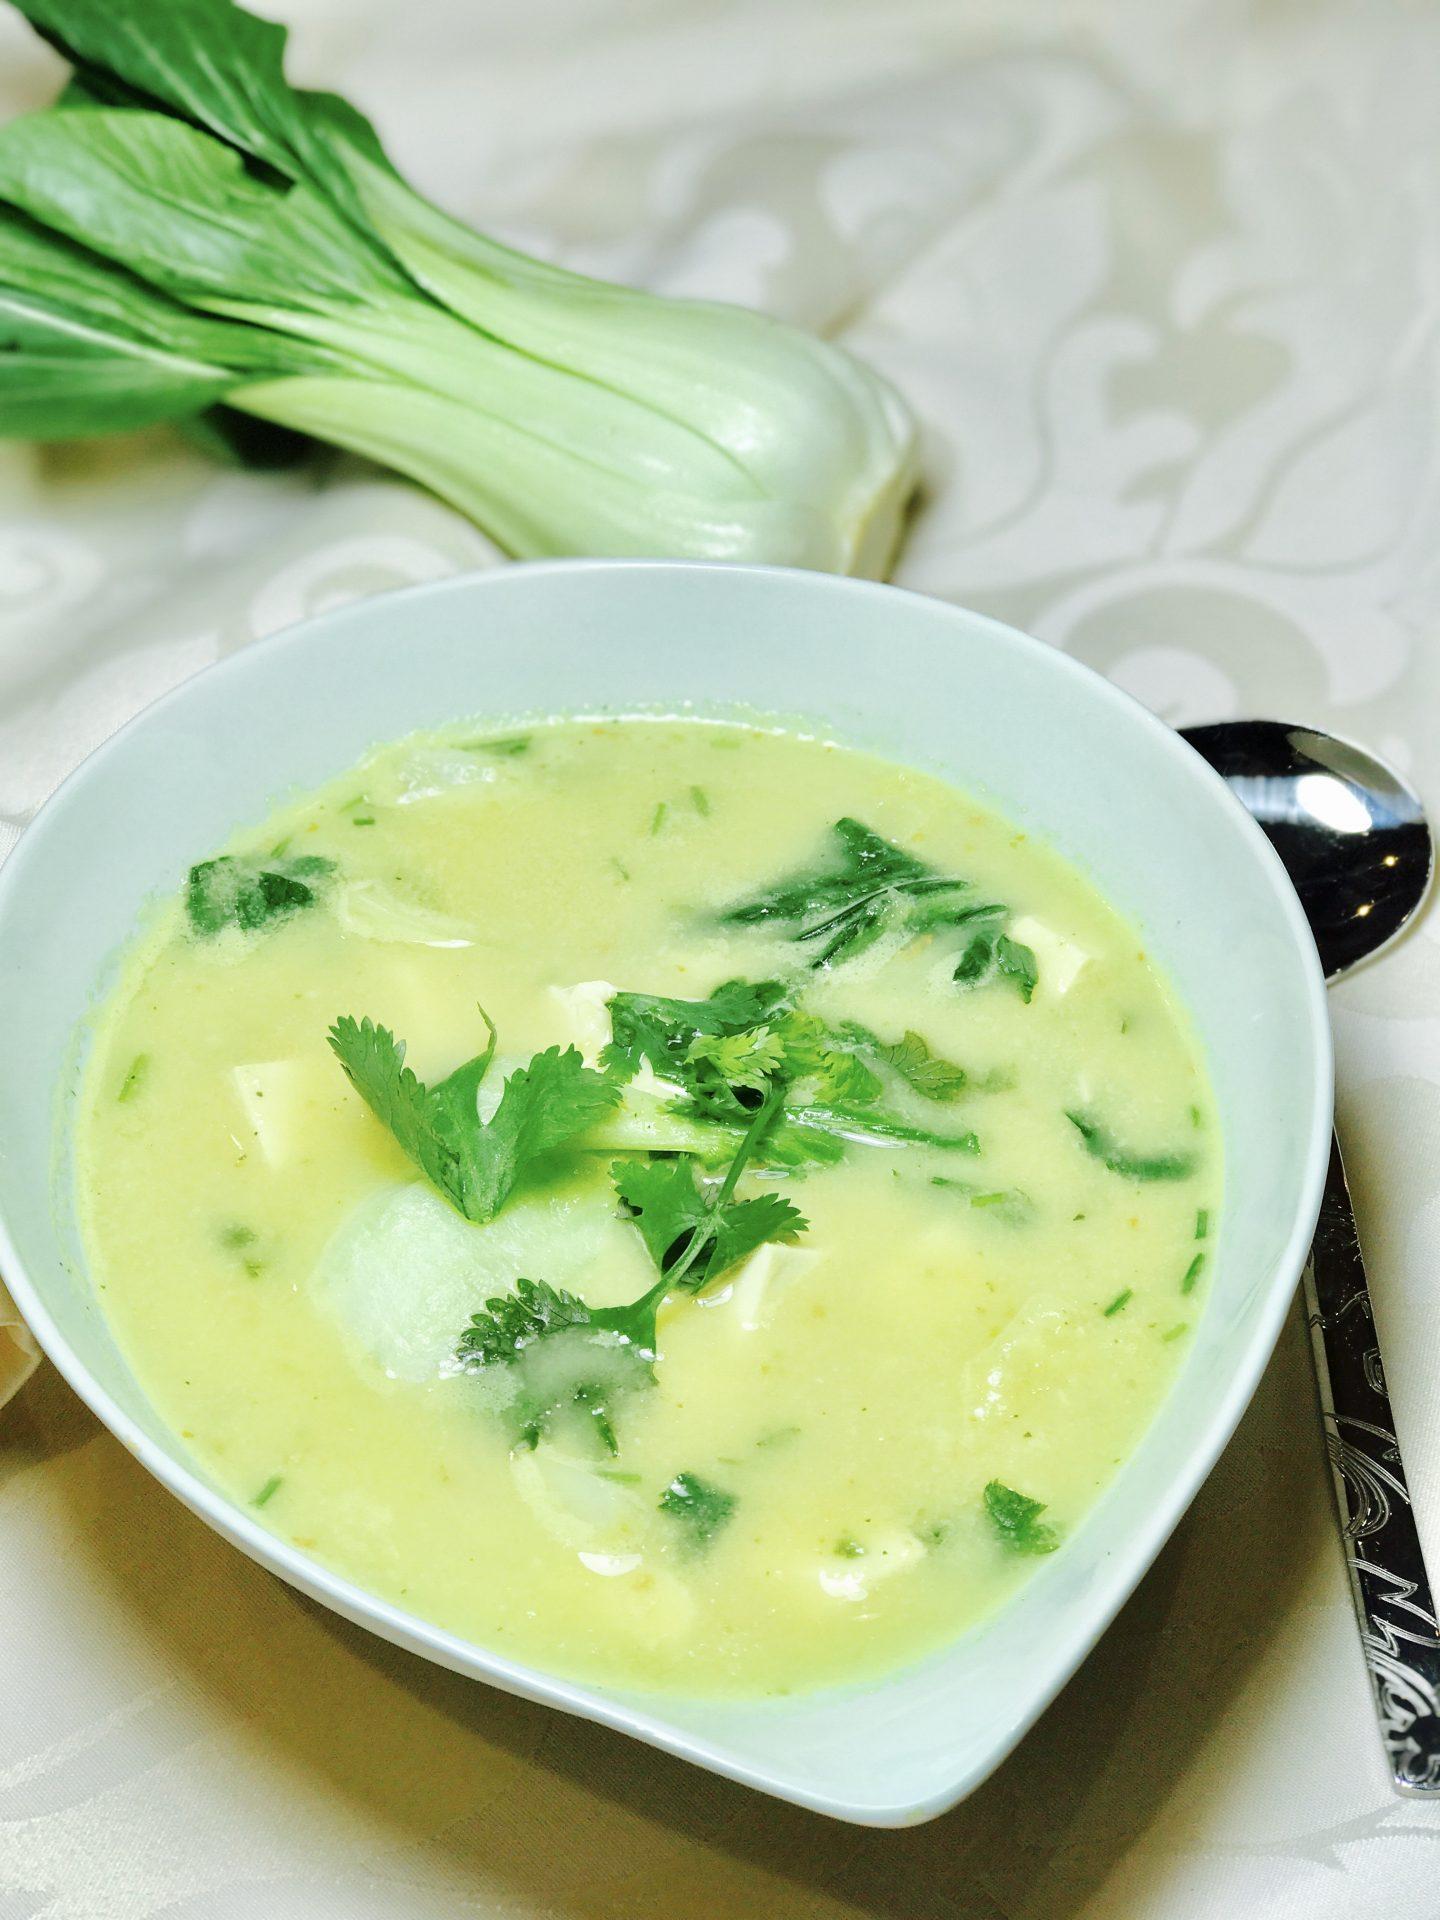 Cauli-Choi Tofu Soup